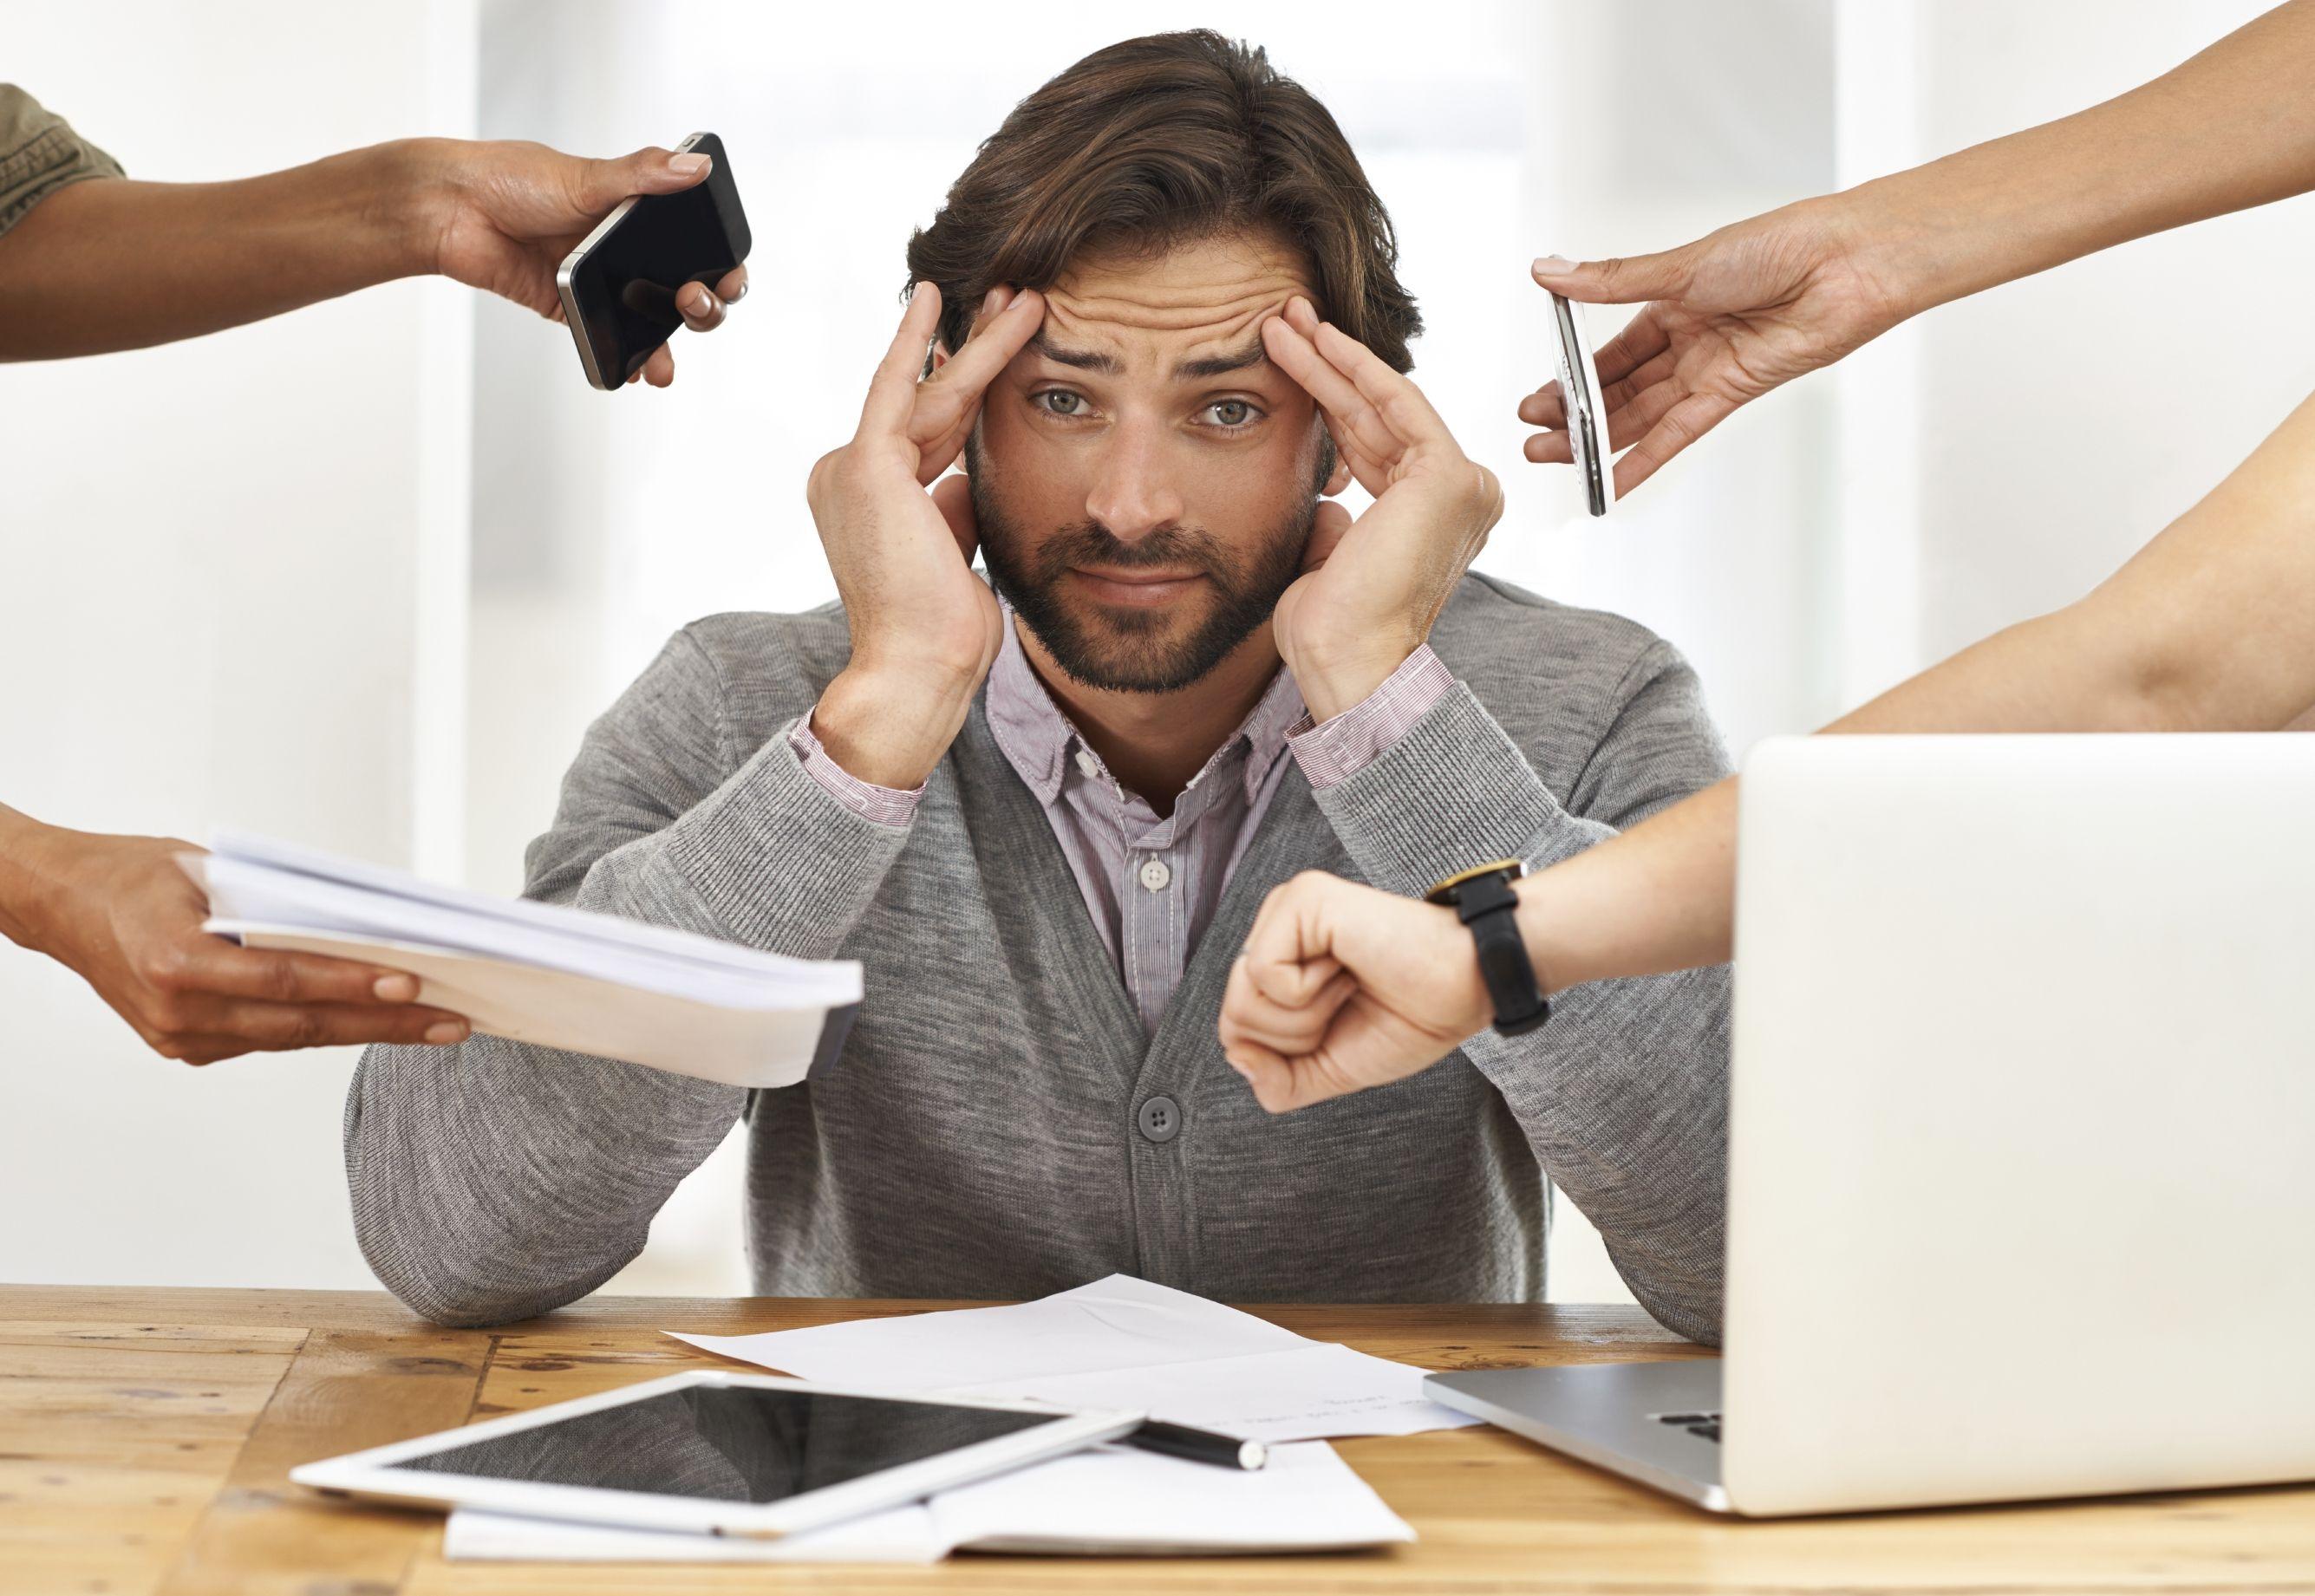 ¿A quién mata más el estrés laboral, a hombres o a mujeres?